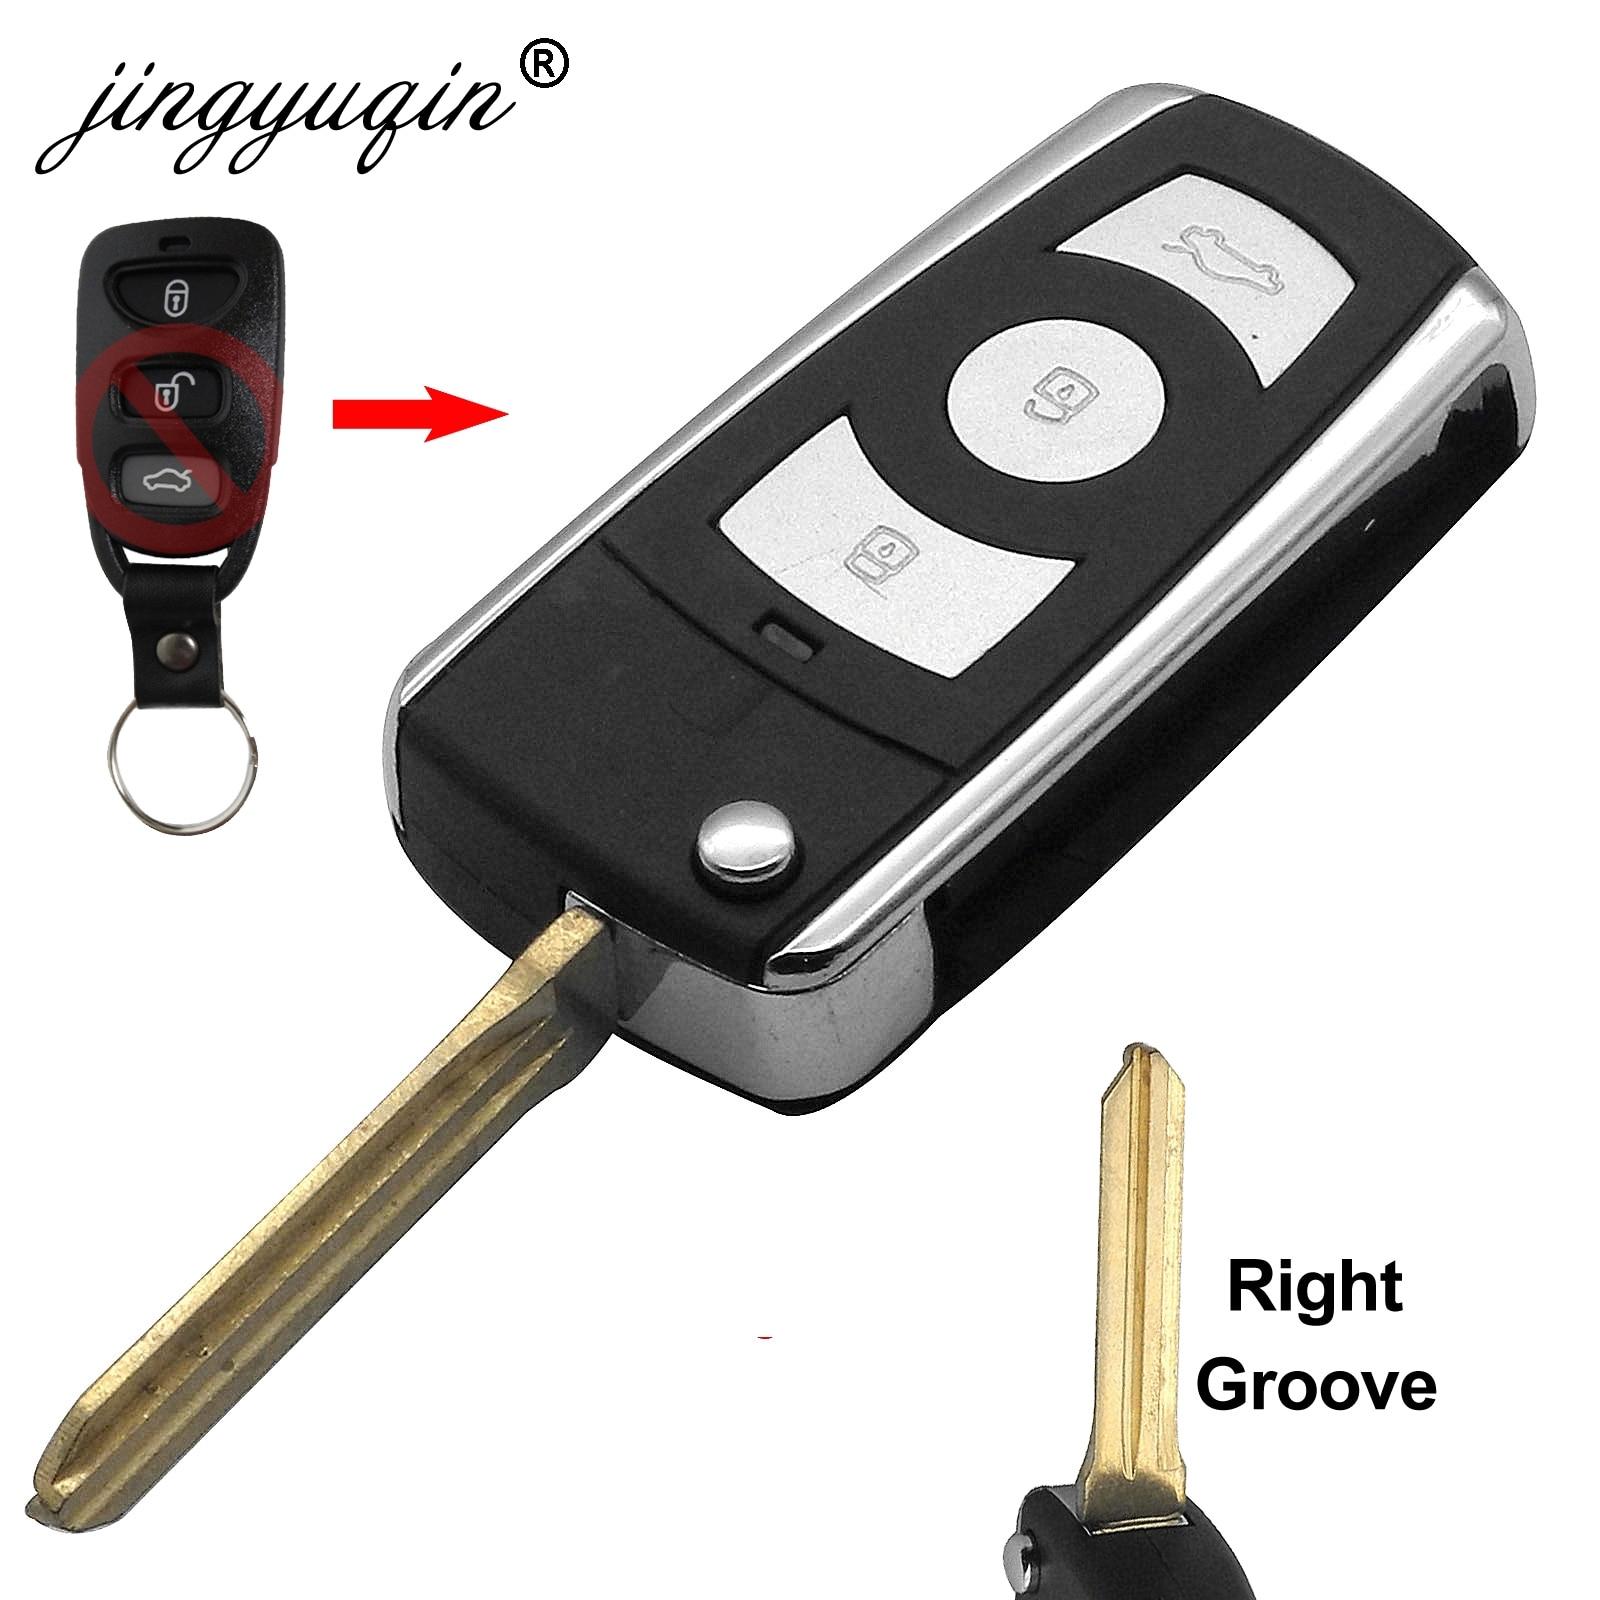 Jinyuqin sağ bıçak 3 düğmeler modifiye Flip anahtar kılıfı için HYUNDAI Coupe Tucson Elantra Accent Santa Fe i10 Kia fob vaka